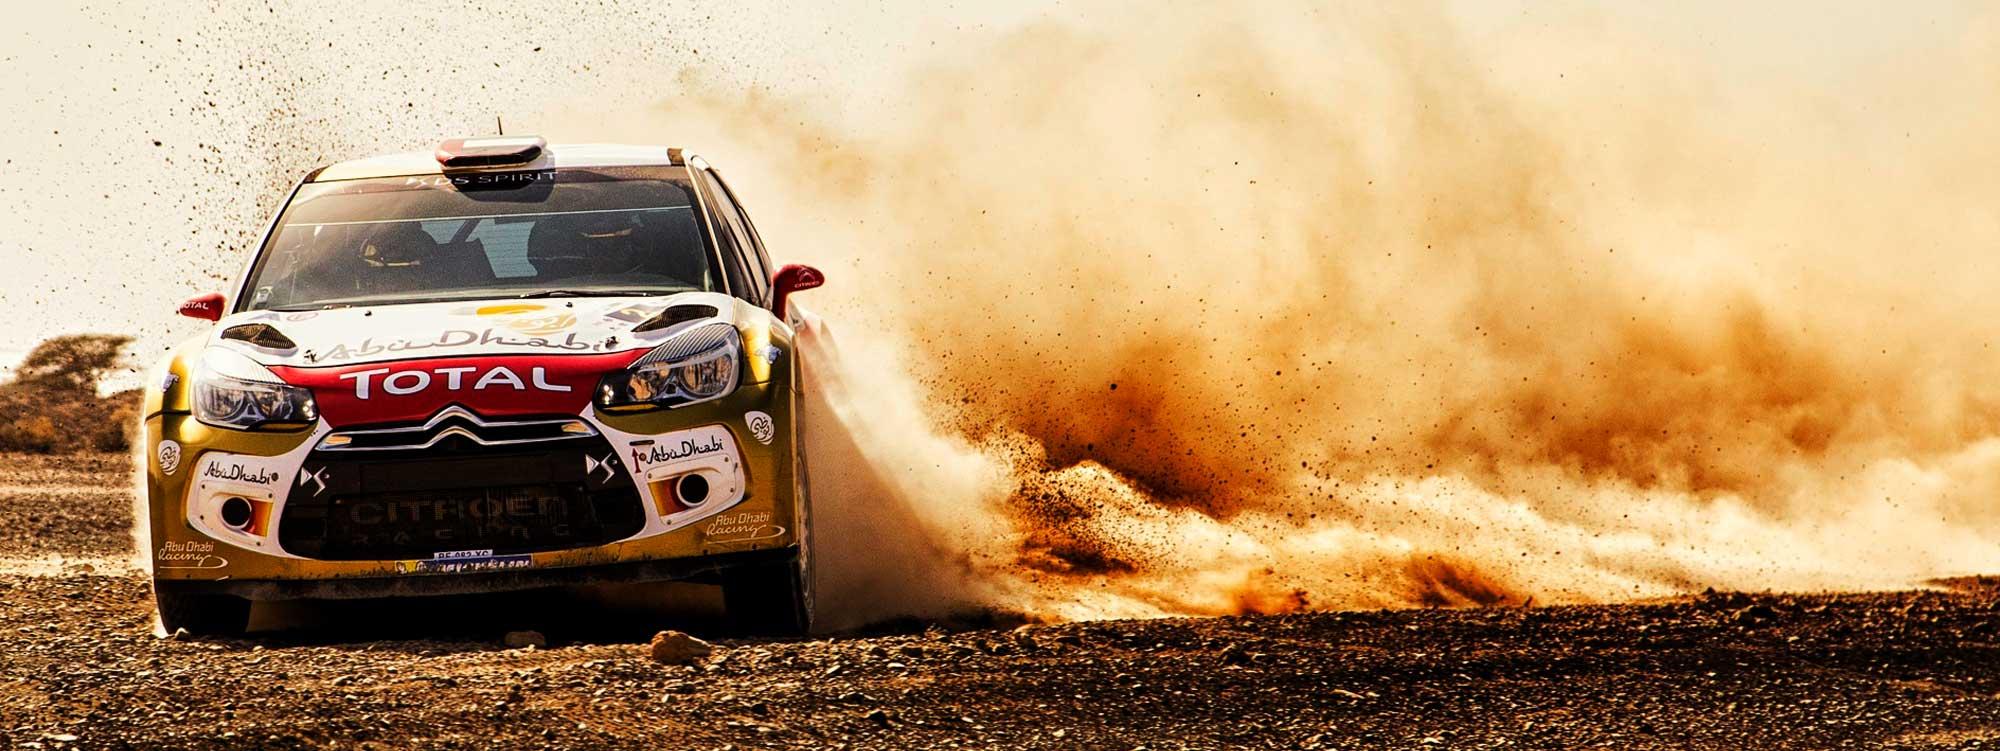 racing-bg-3